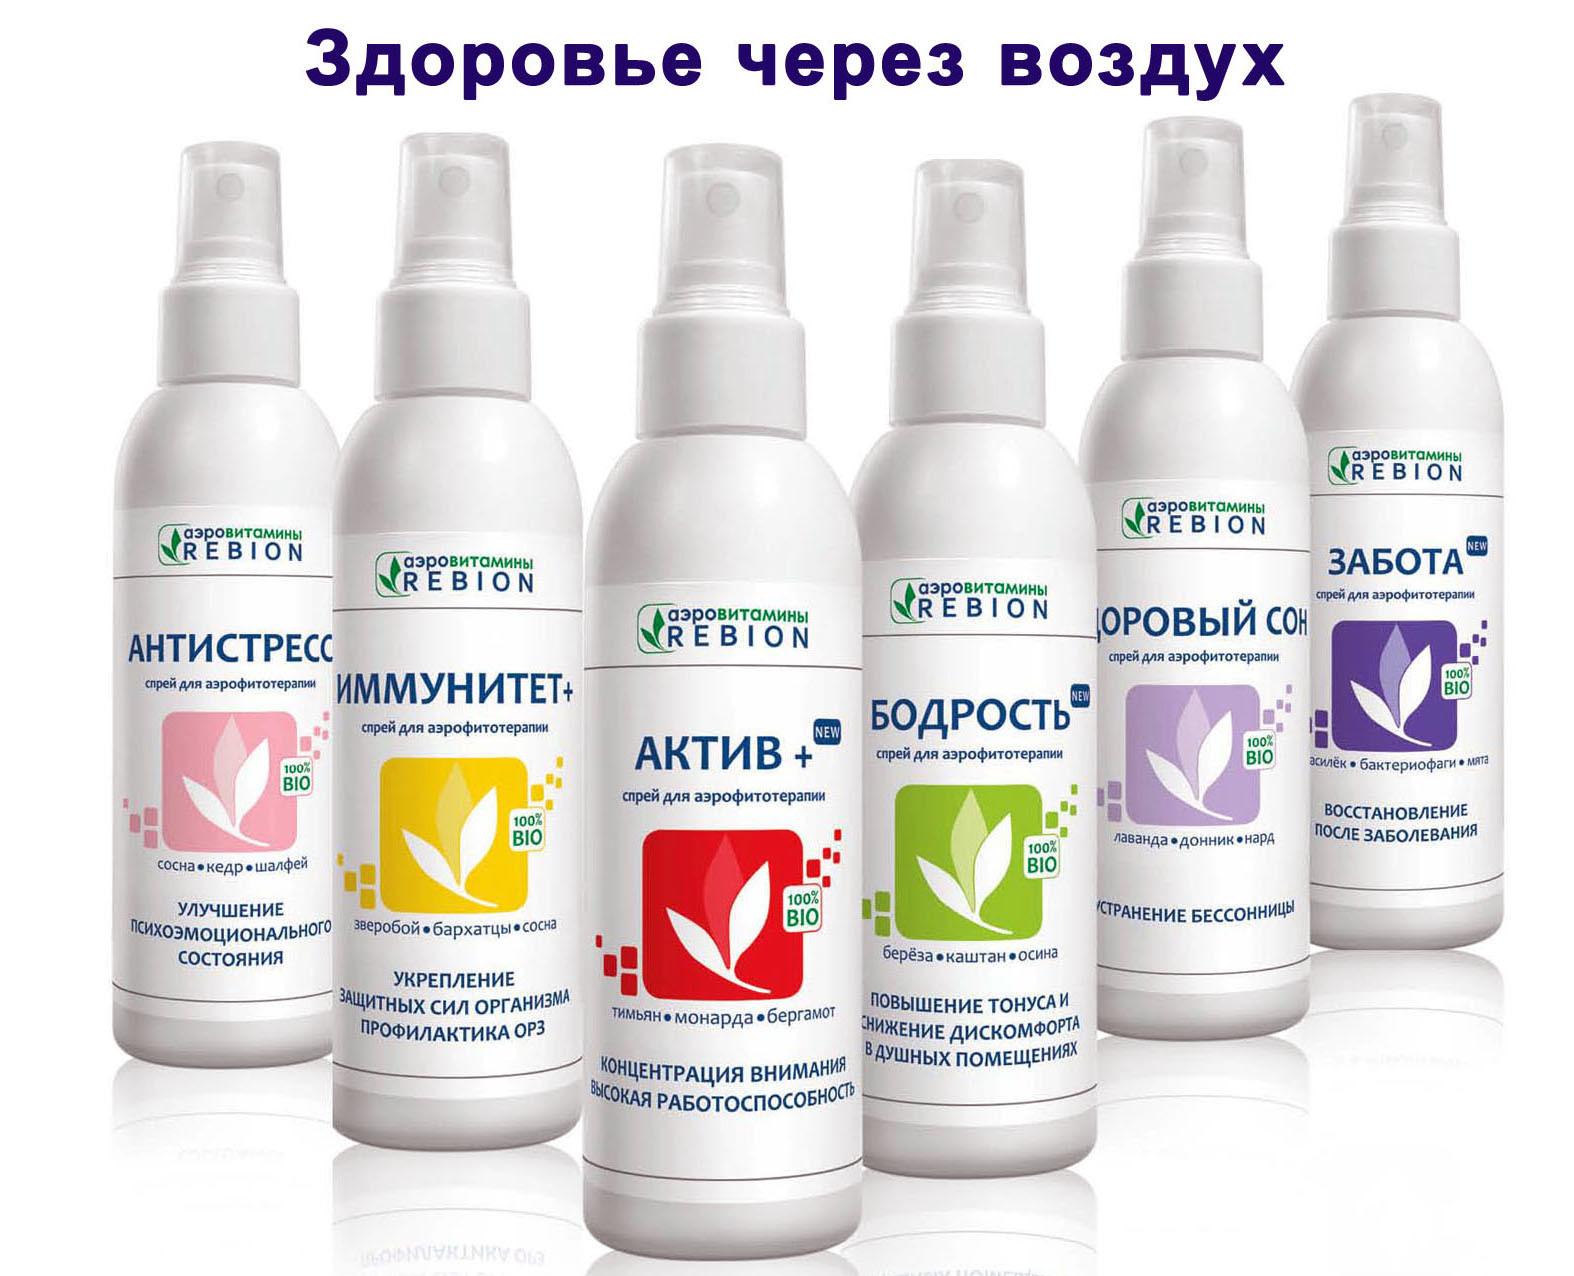 АЭРОВИТАМИНЫ РЕБИОН - для иммунитета